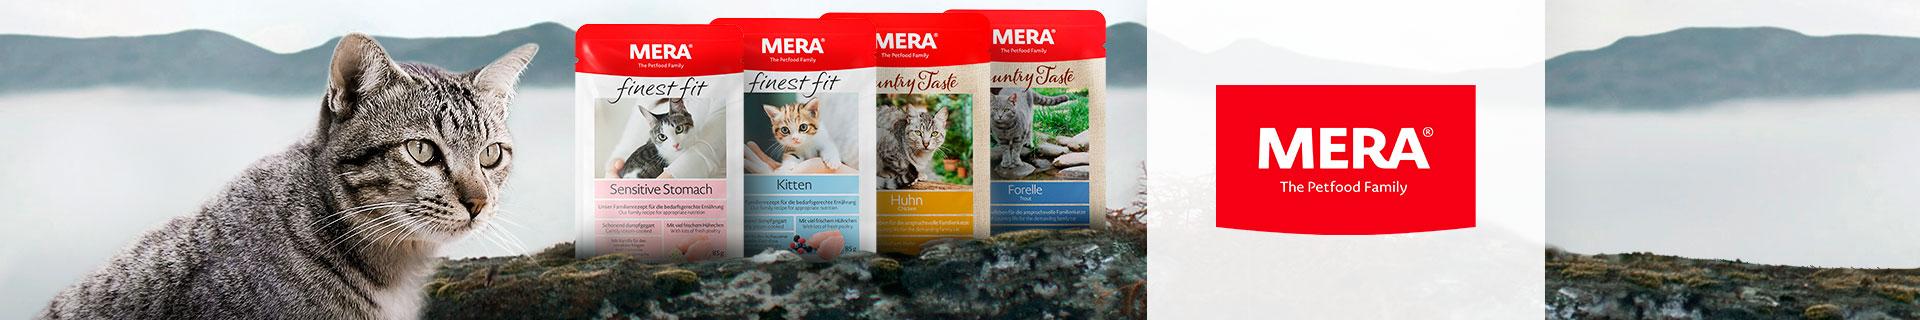 Markenshop - Mera - Nassfutter -Katze